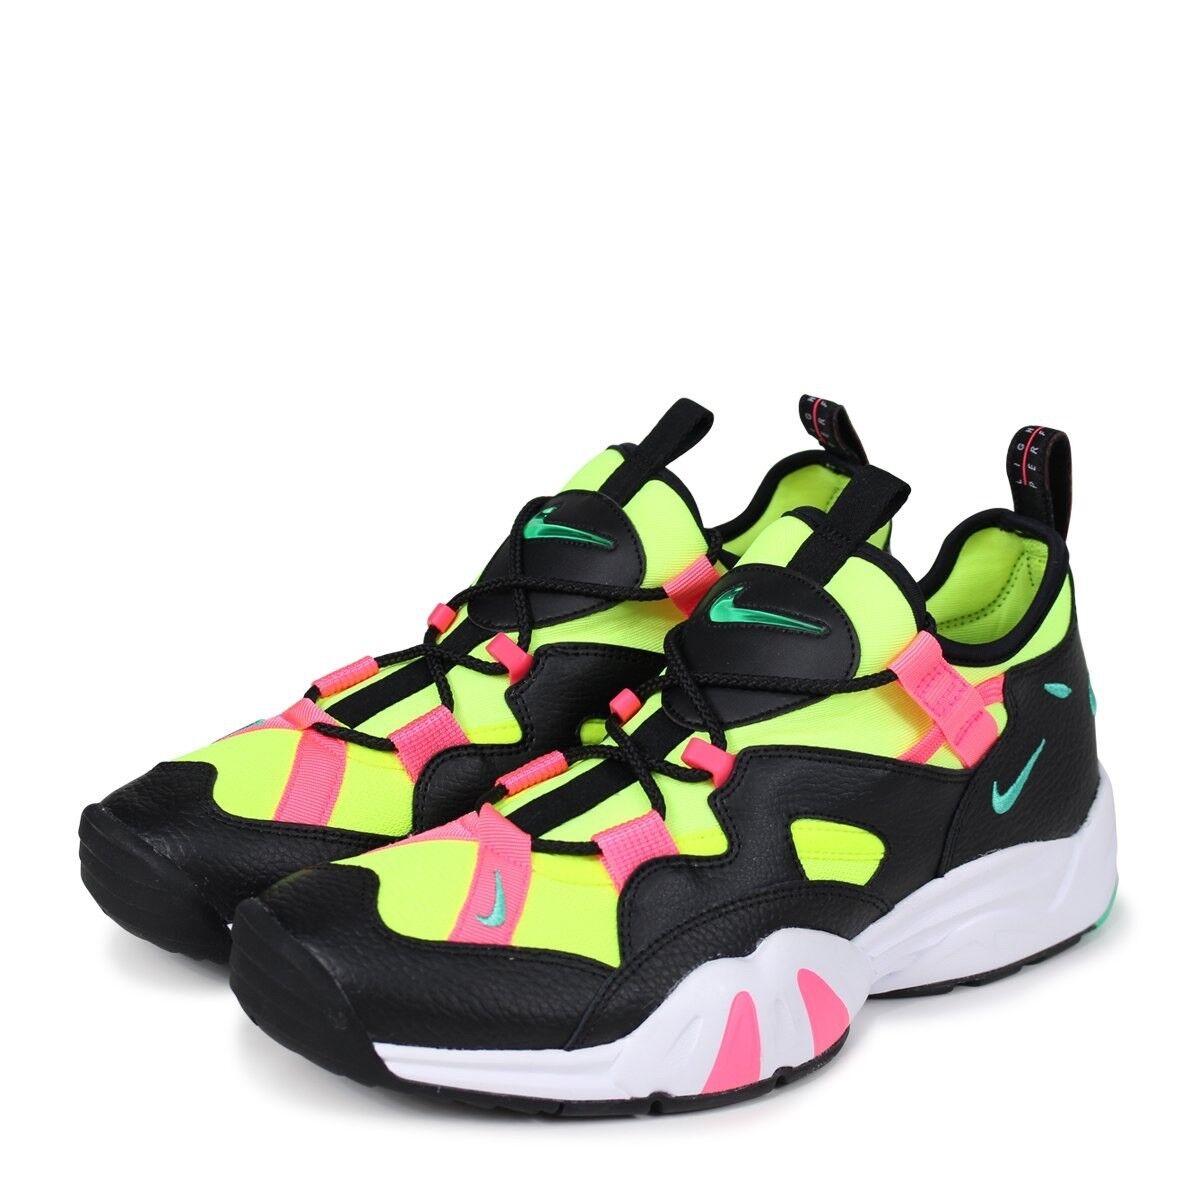 Men's Nike Air Scream LWP Training shoes Black Menta Racer Racer Racer Pink Volt AH8517 001 6a4b97